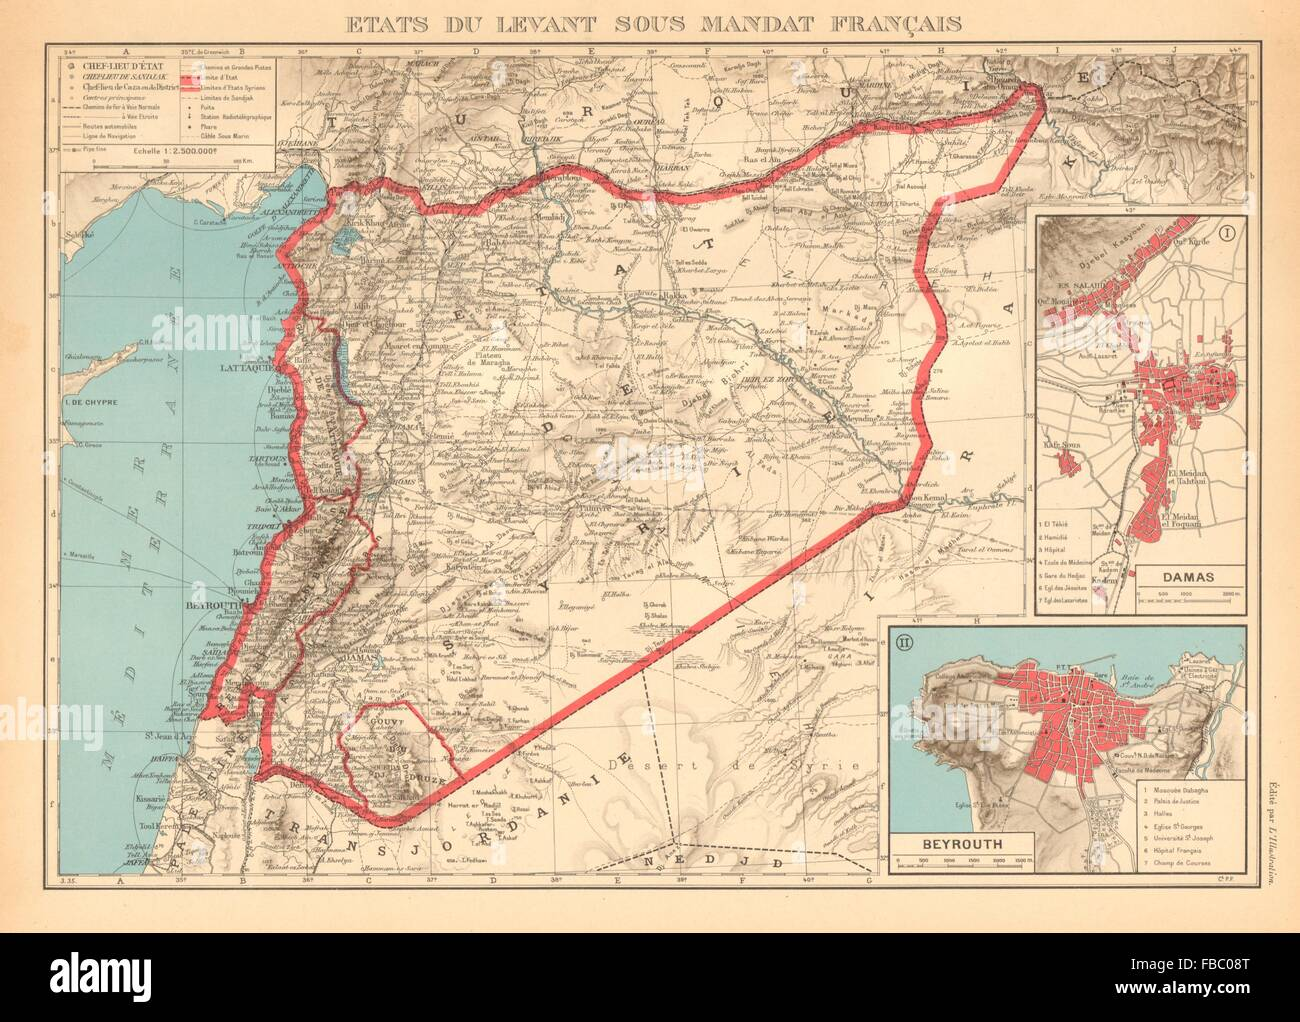 french mandate in lebanon